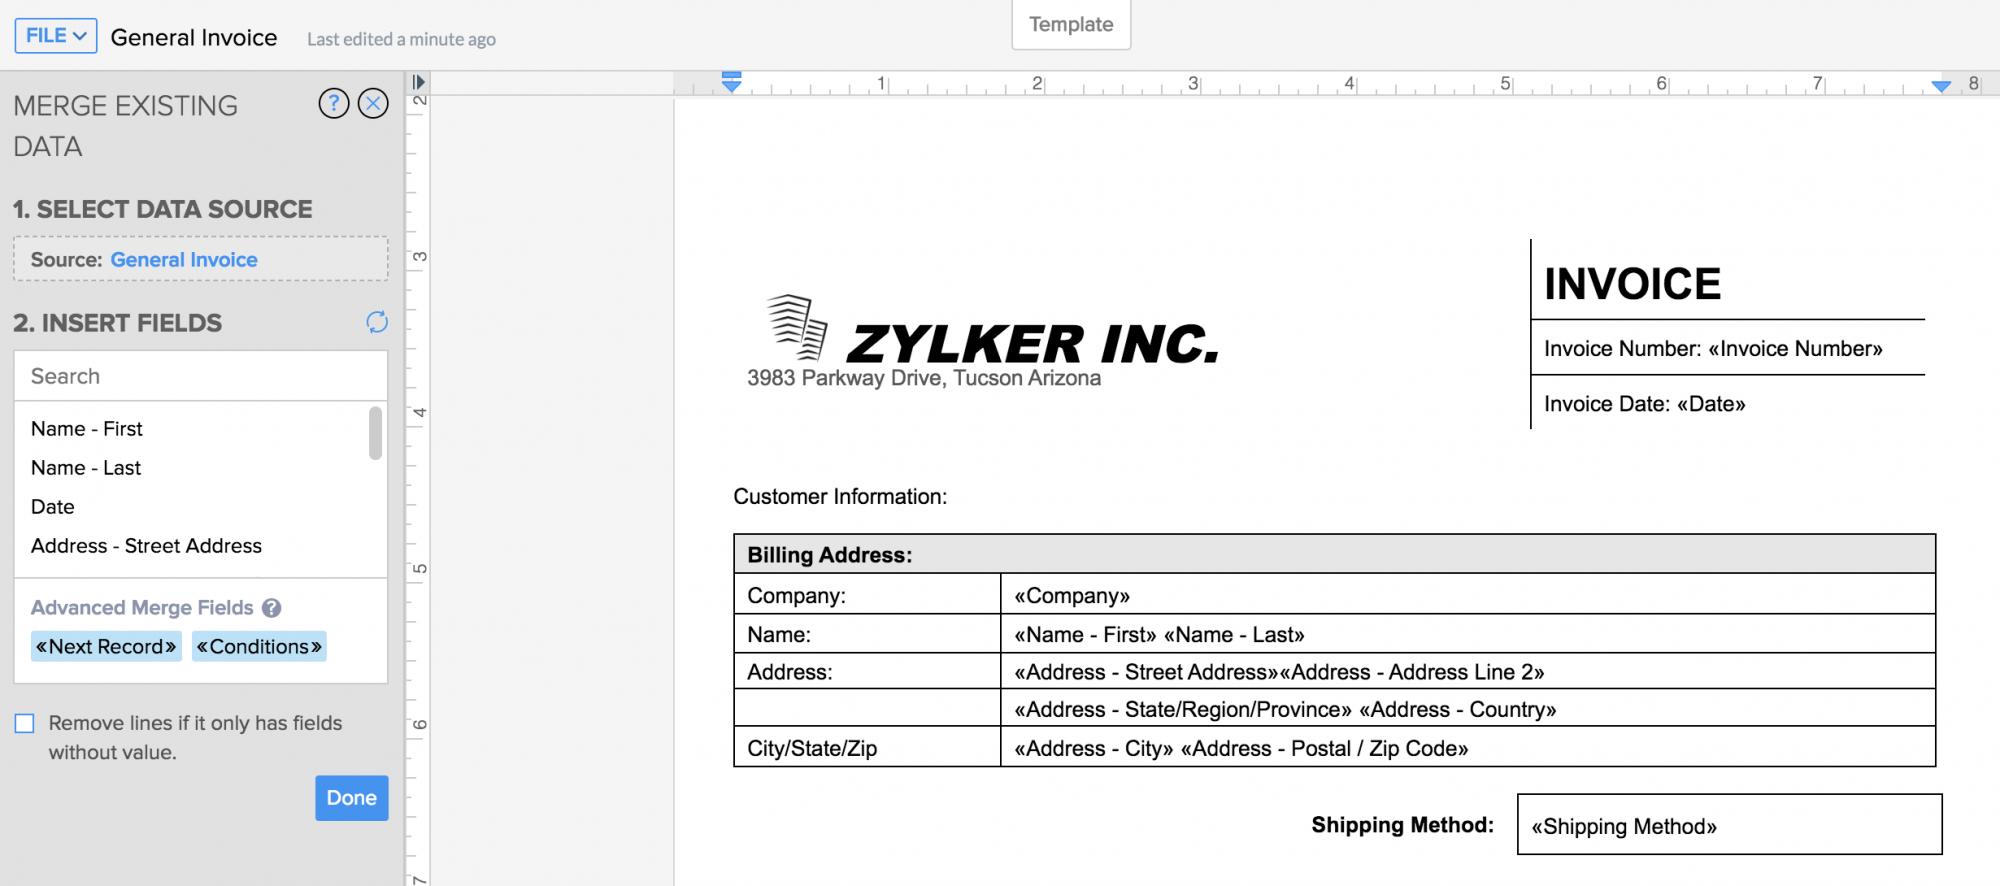 Document Merge using Zoho Writer   Zoho Forms - User Guide